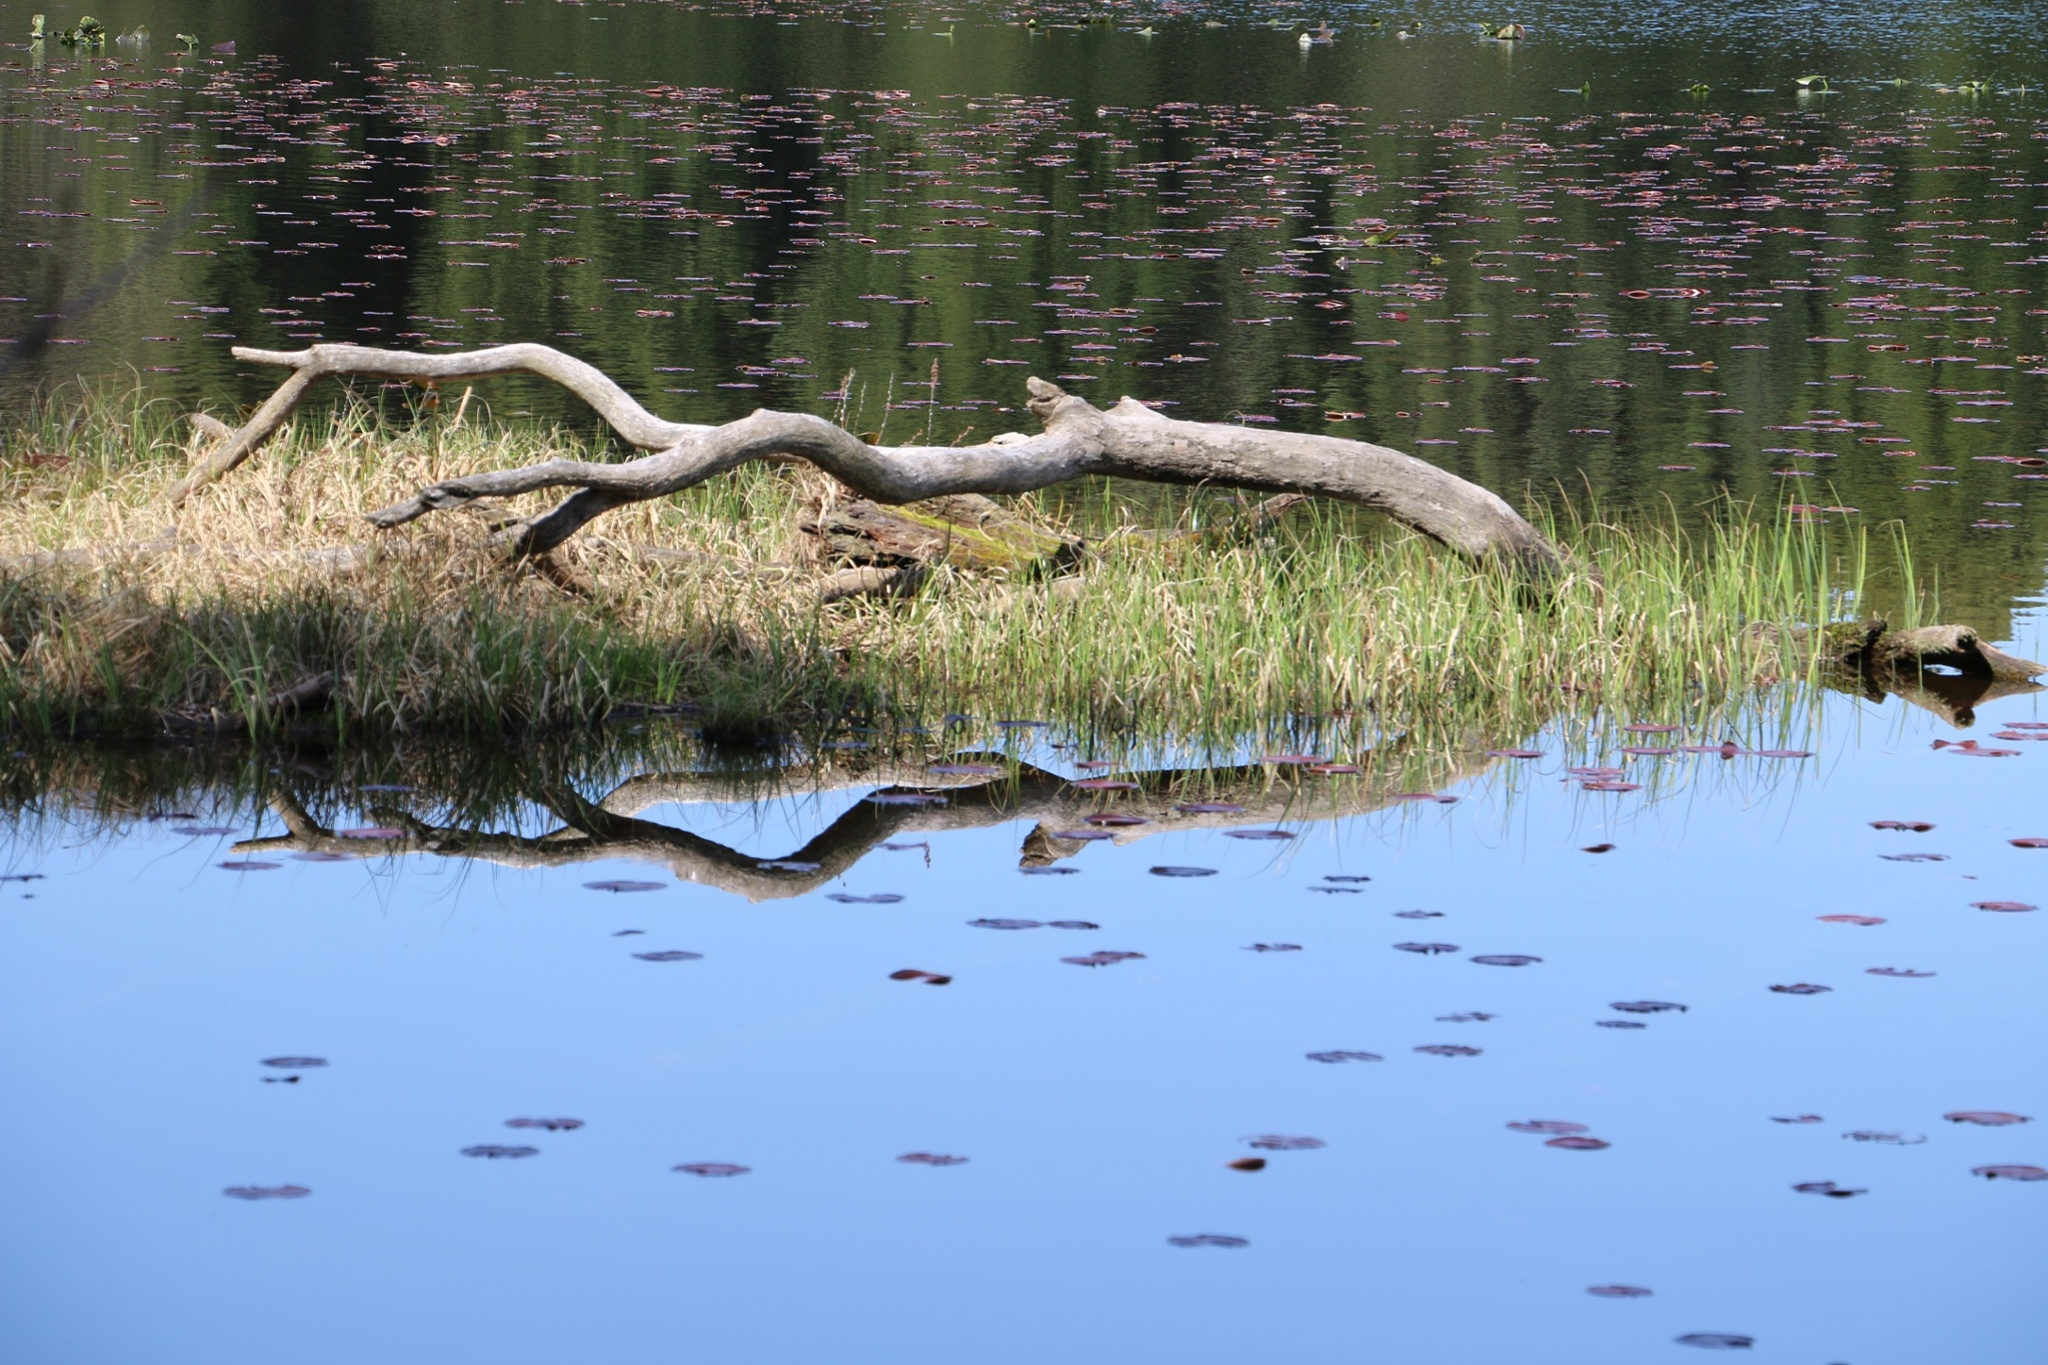 Waterscape lake image by DAVatalaro